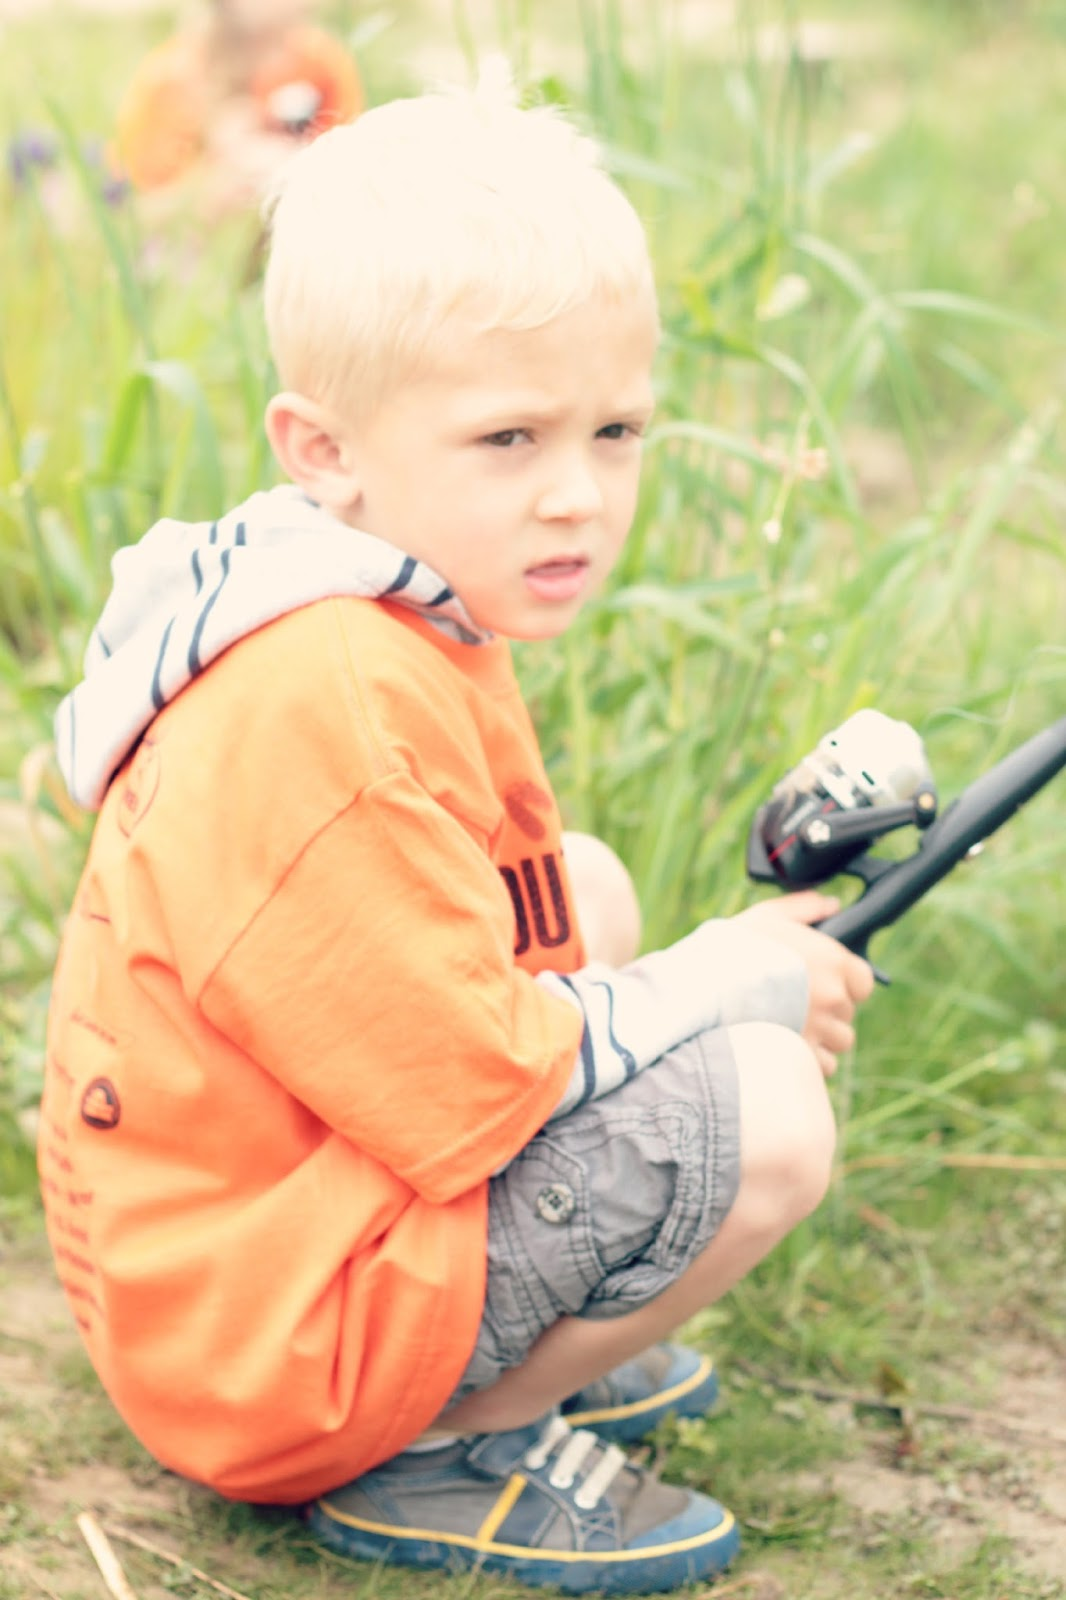 e0595-fishing2b.jpg